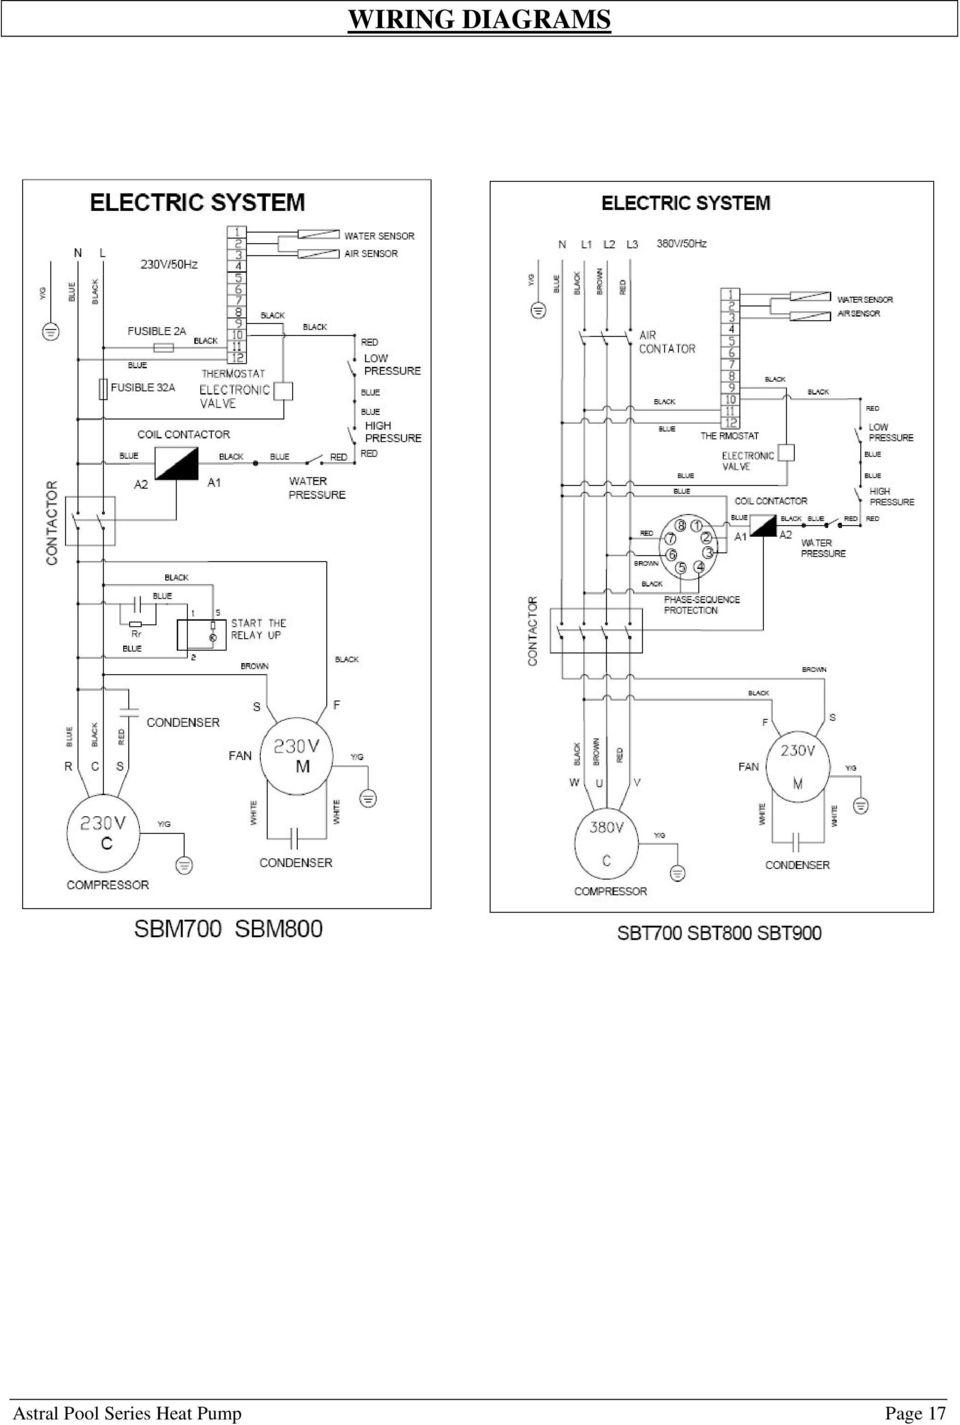 medium resolution of 18 wiring diagrams b600 astral pool series heat pump page 18